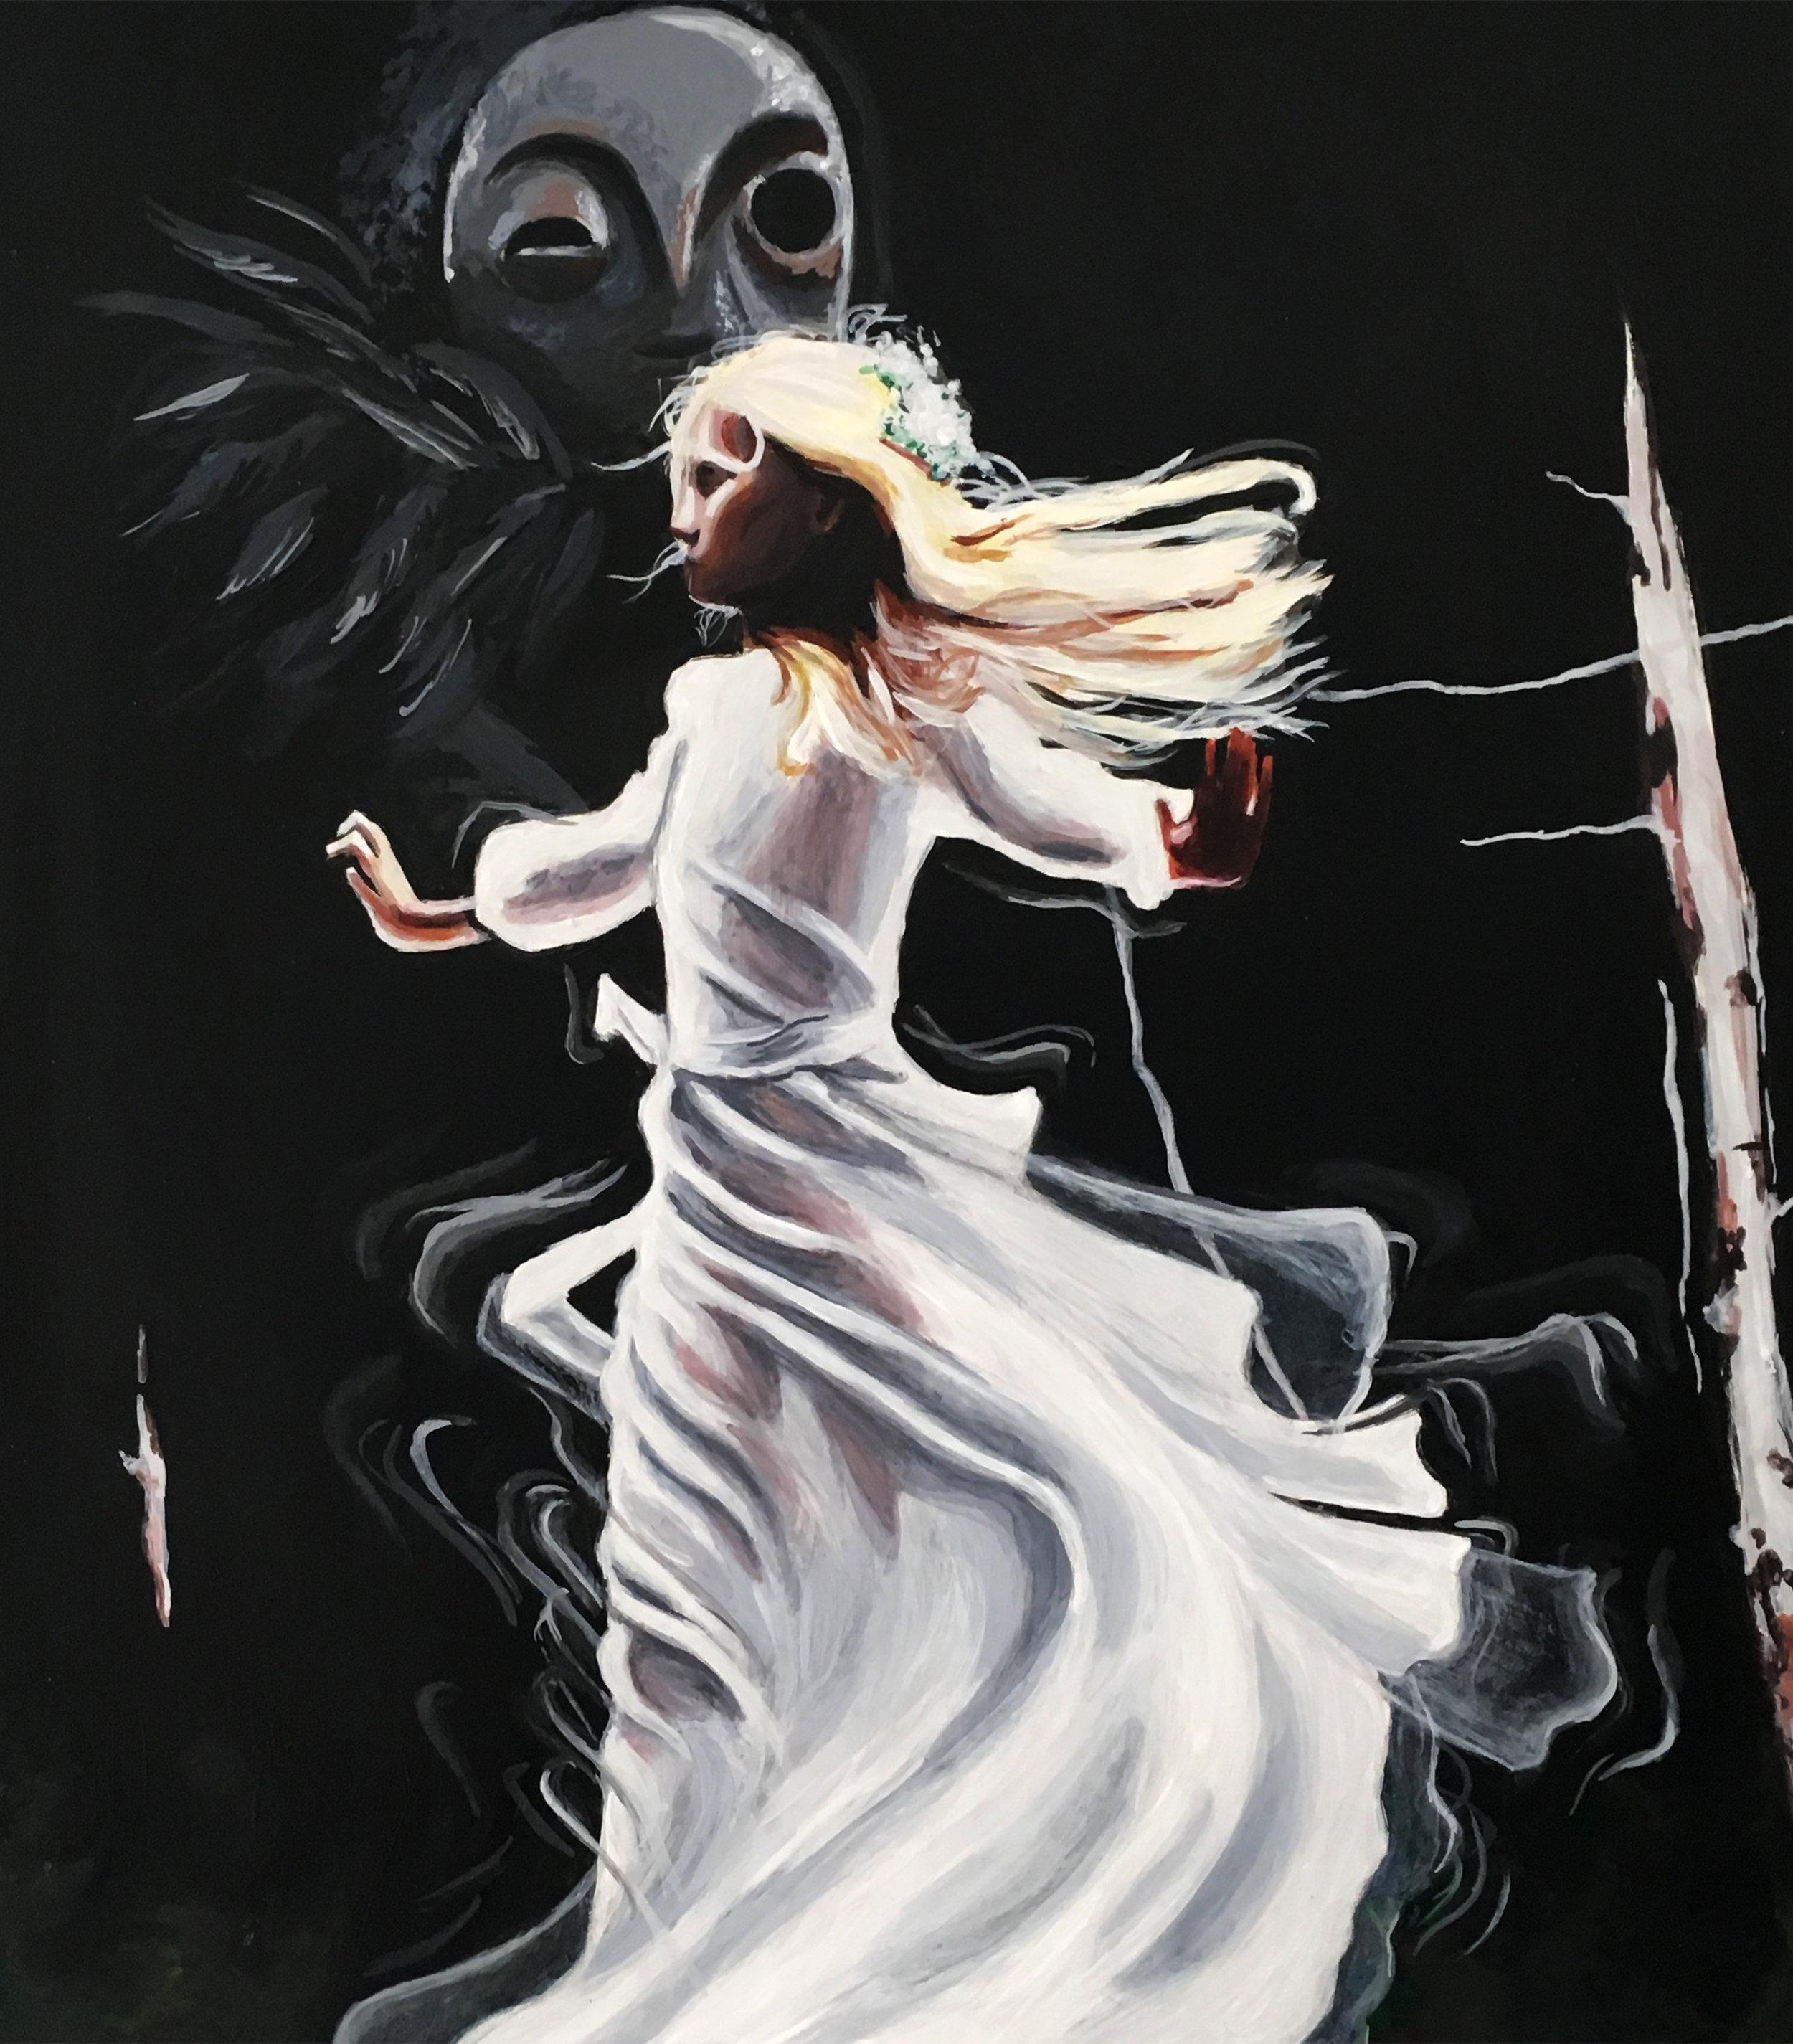 Futurism- Sensation of Movement